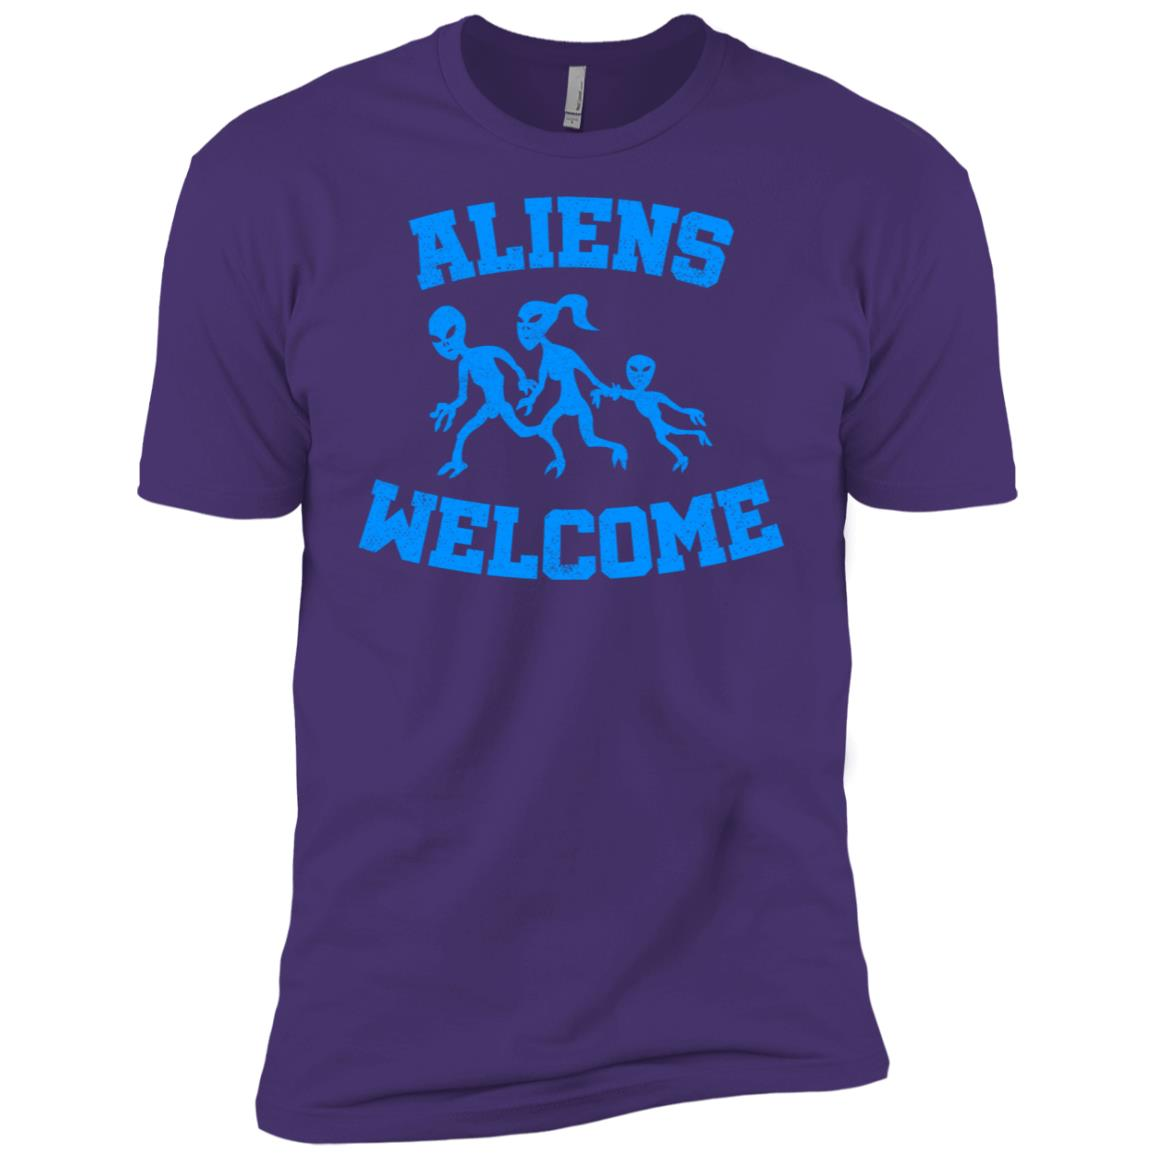 Aliens welcome funny alien and extraterrestrial ls -2 Men Short Sleeve T-Shirt